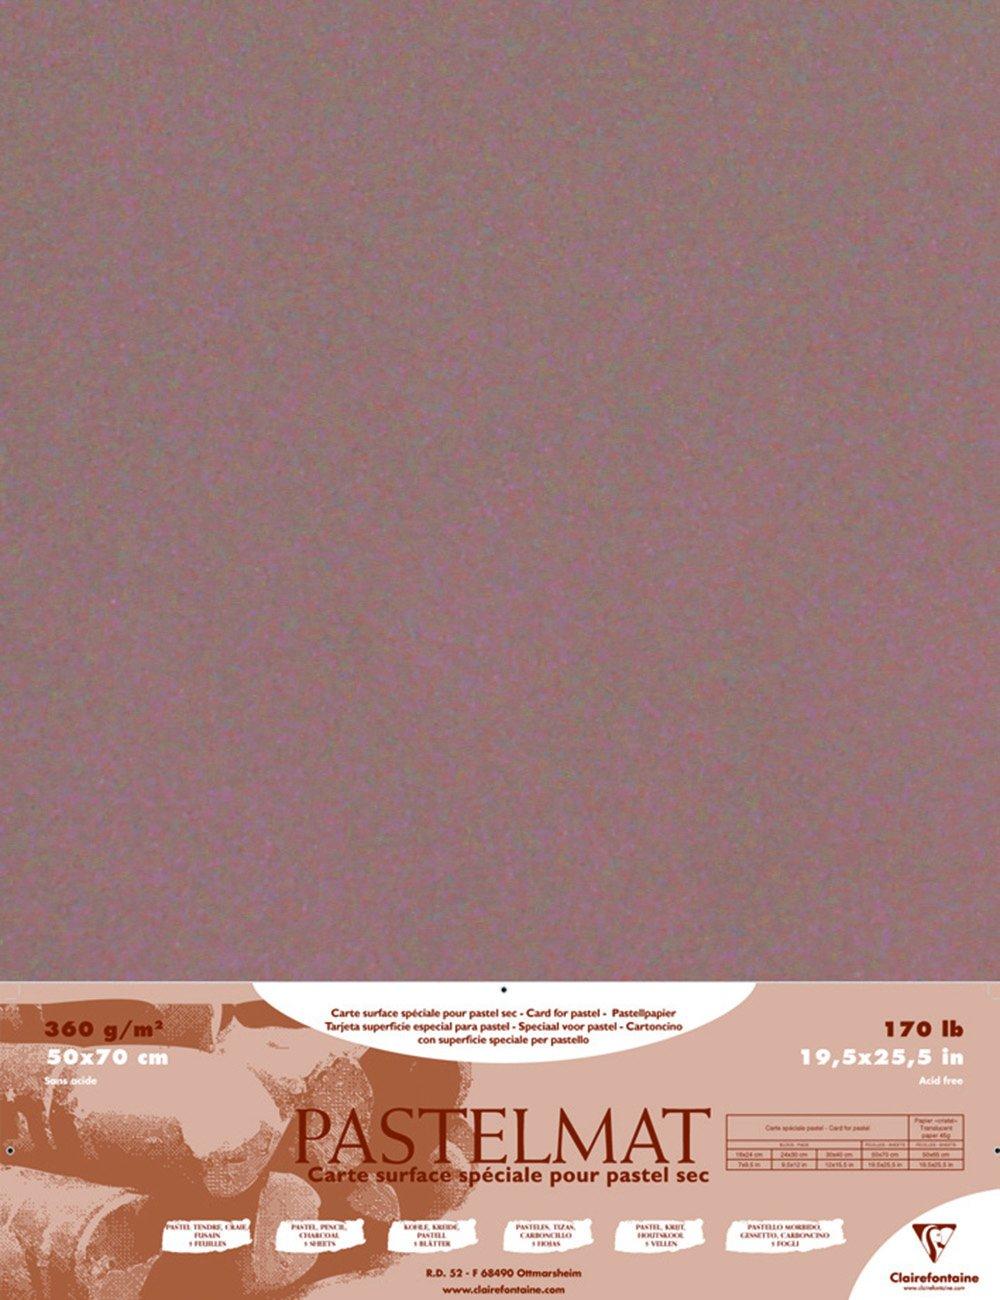 Amazon.com : Pastelmat Card for Pastel - 19.5 x 27.5 Inch ...